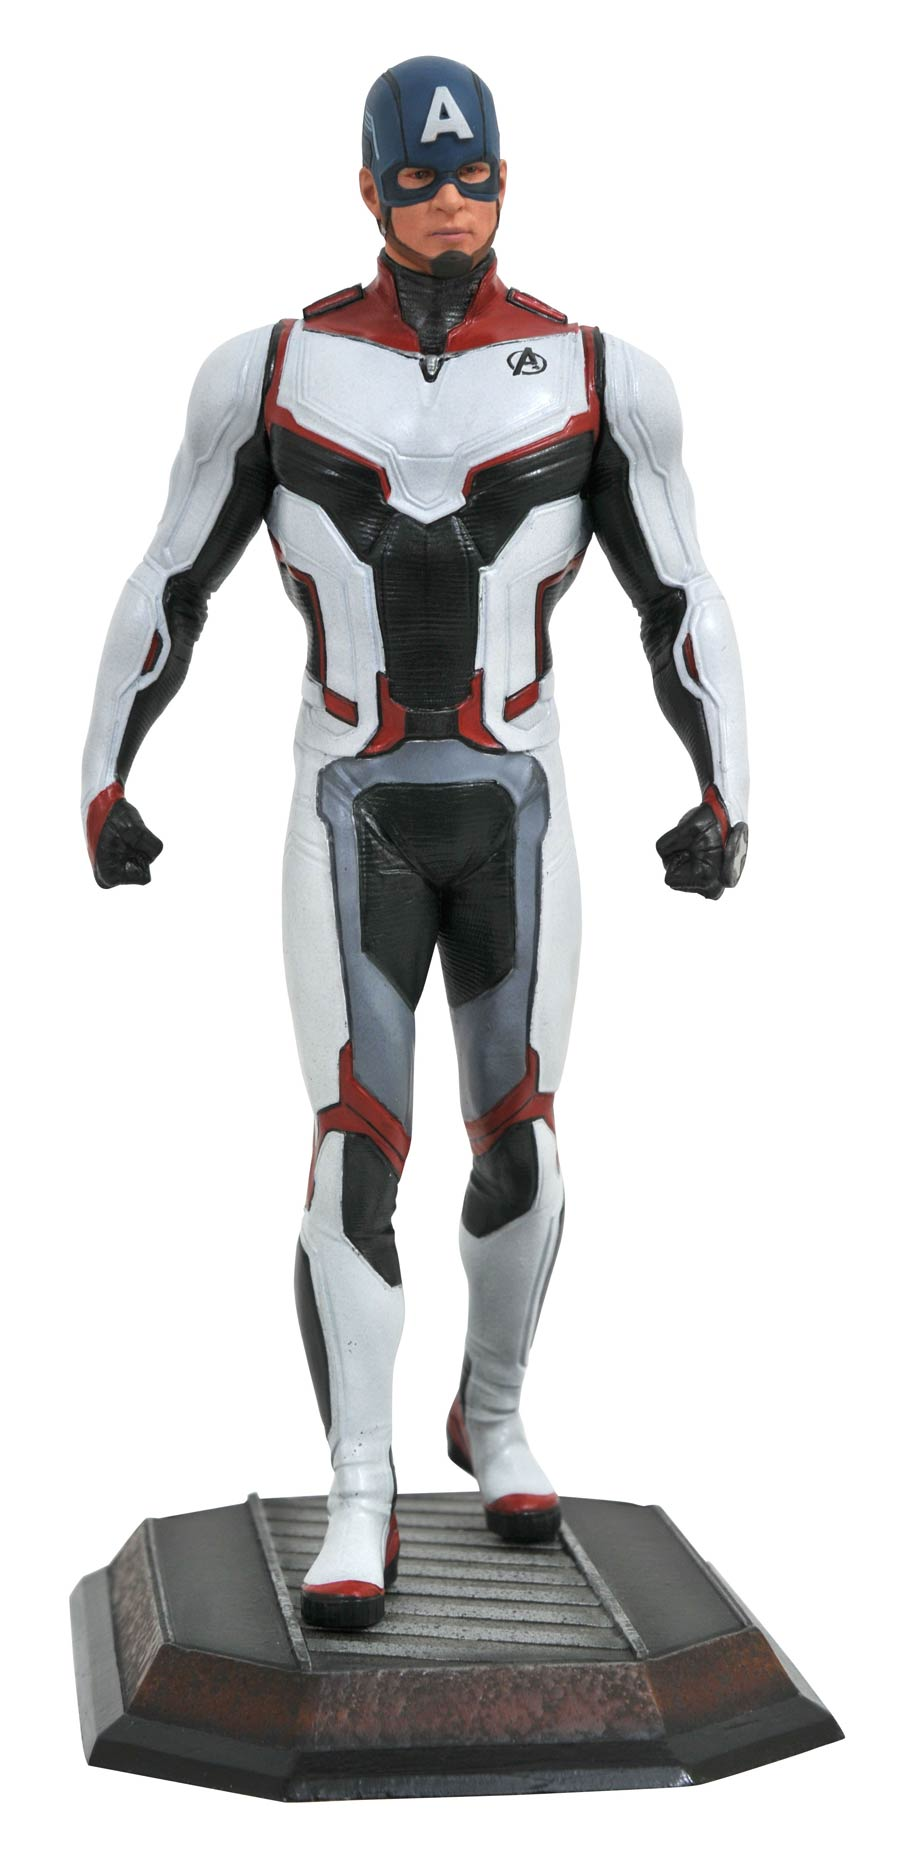 Marvel Movie Gallery Avengers Endgame Team Suit Captain America PVC Statue